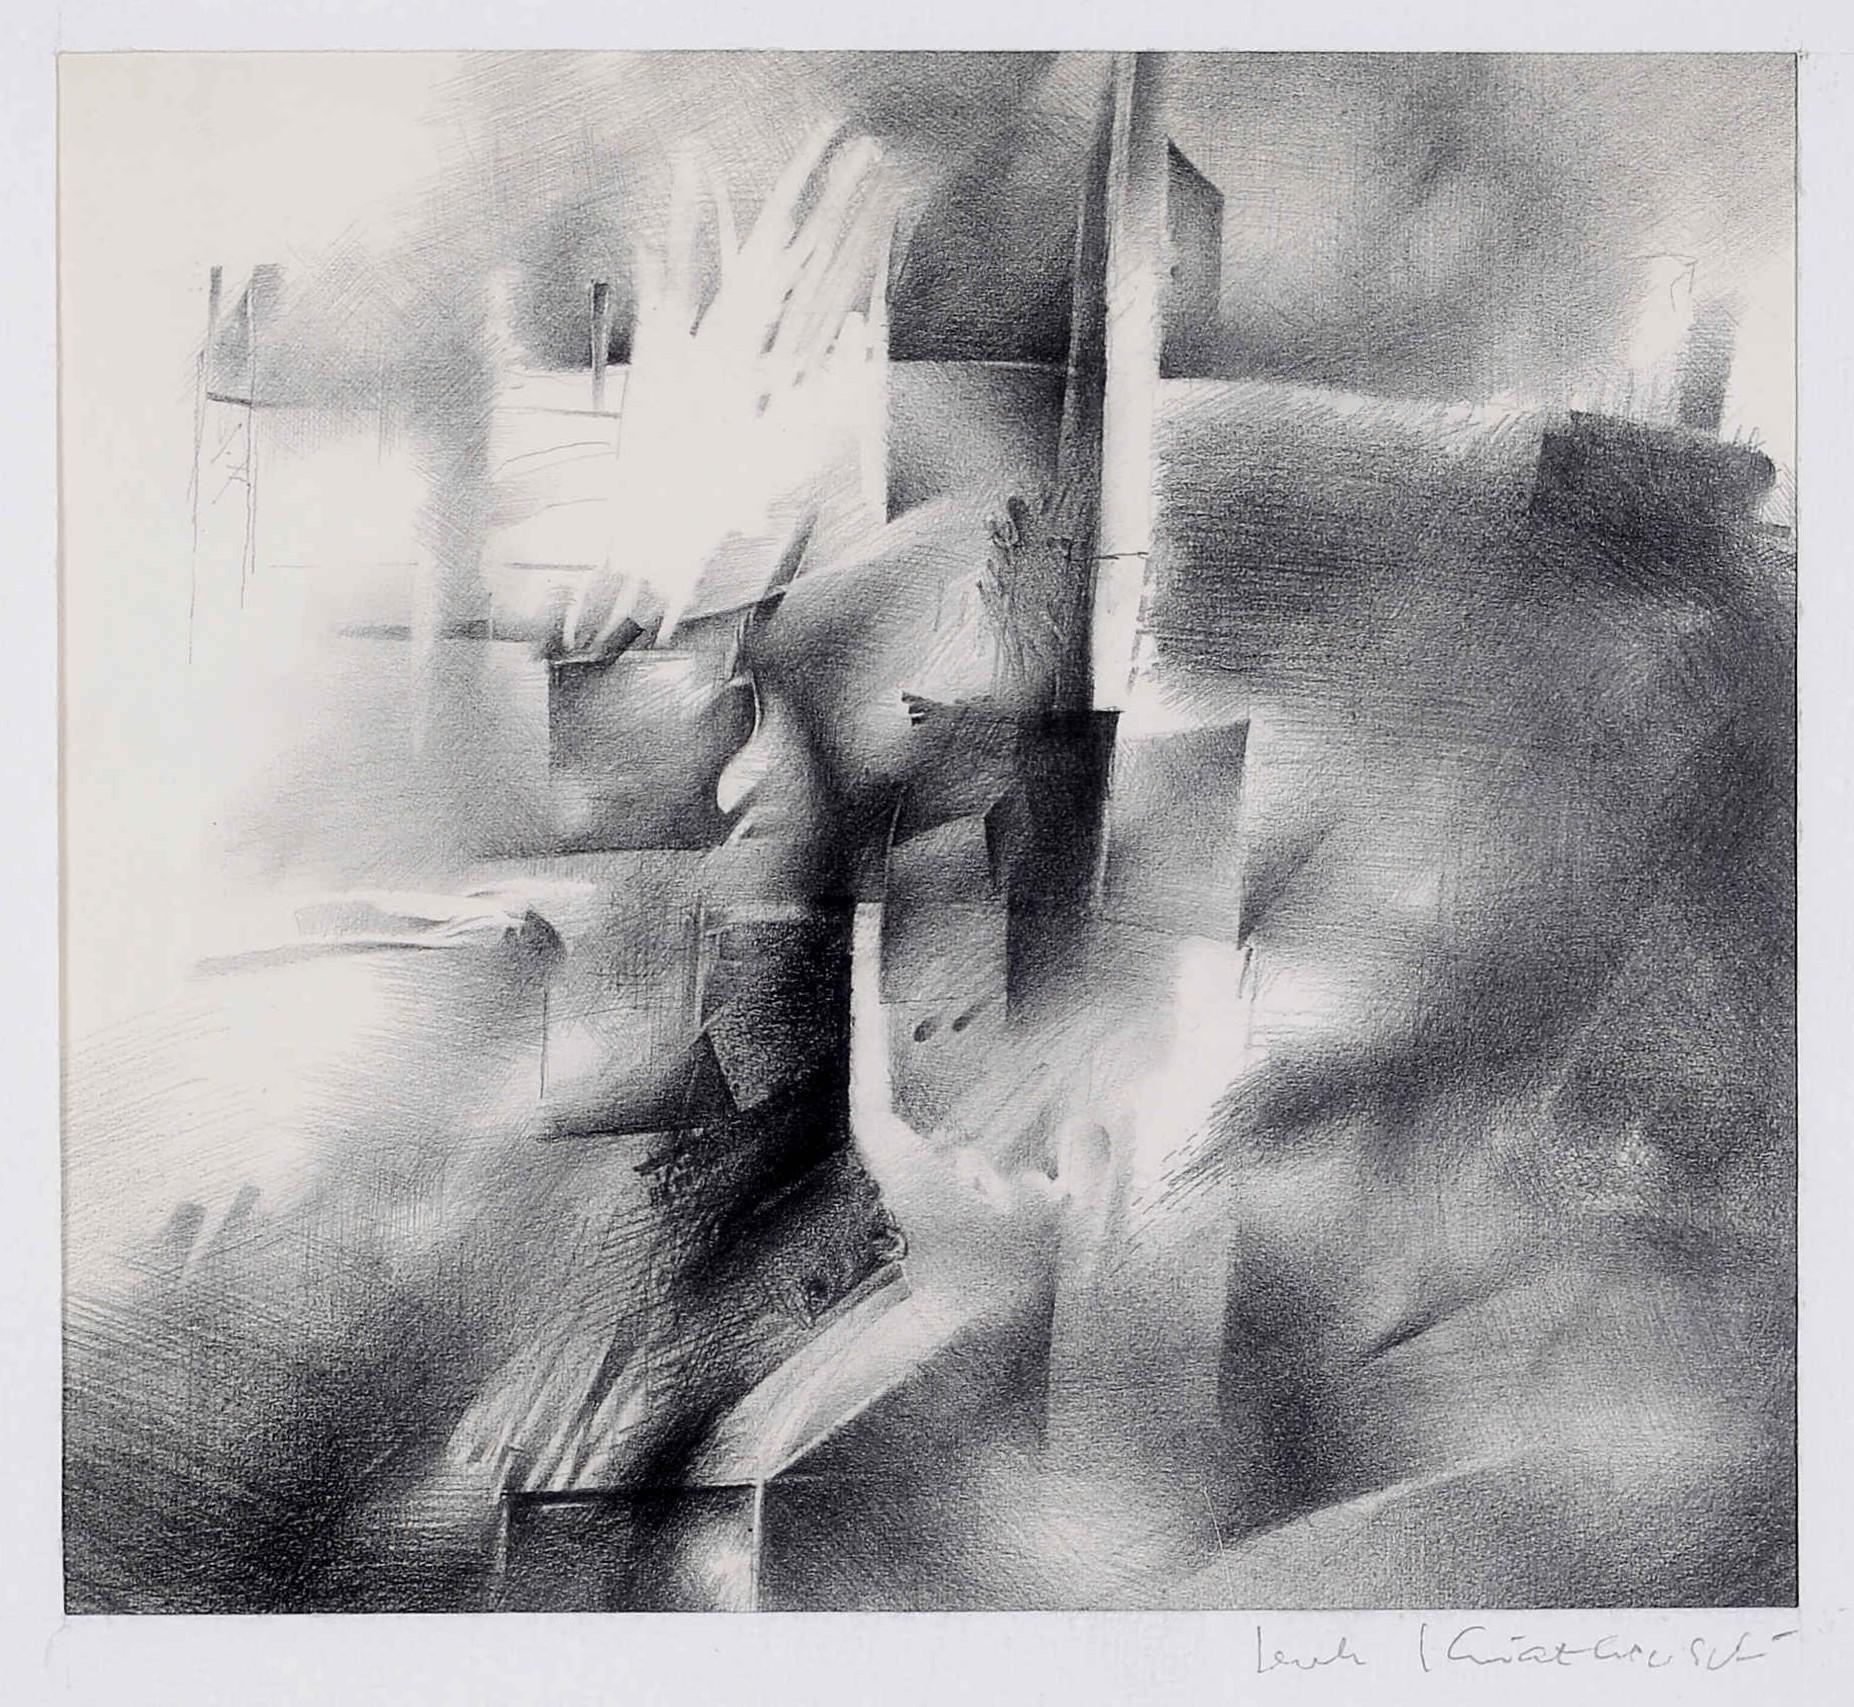 Bez tytułu, 1986